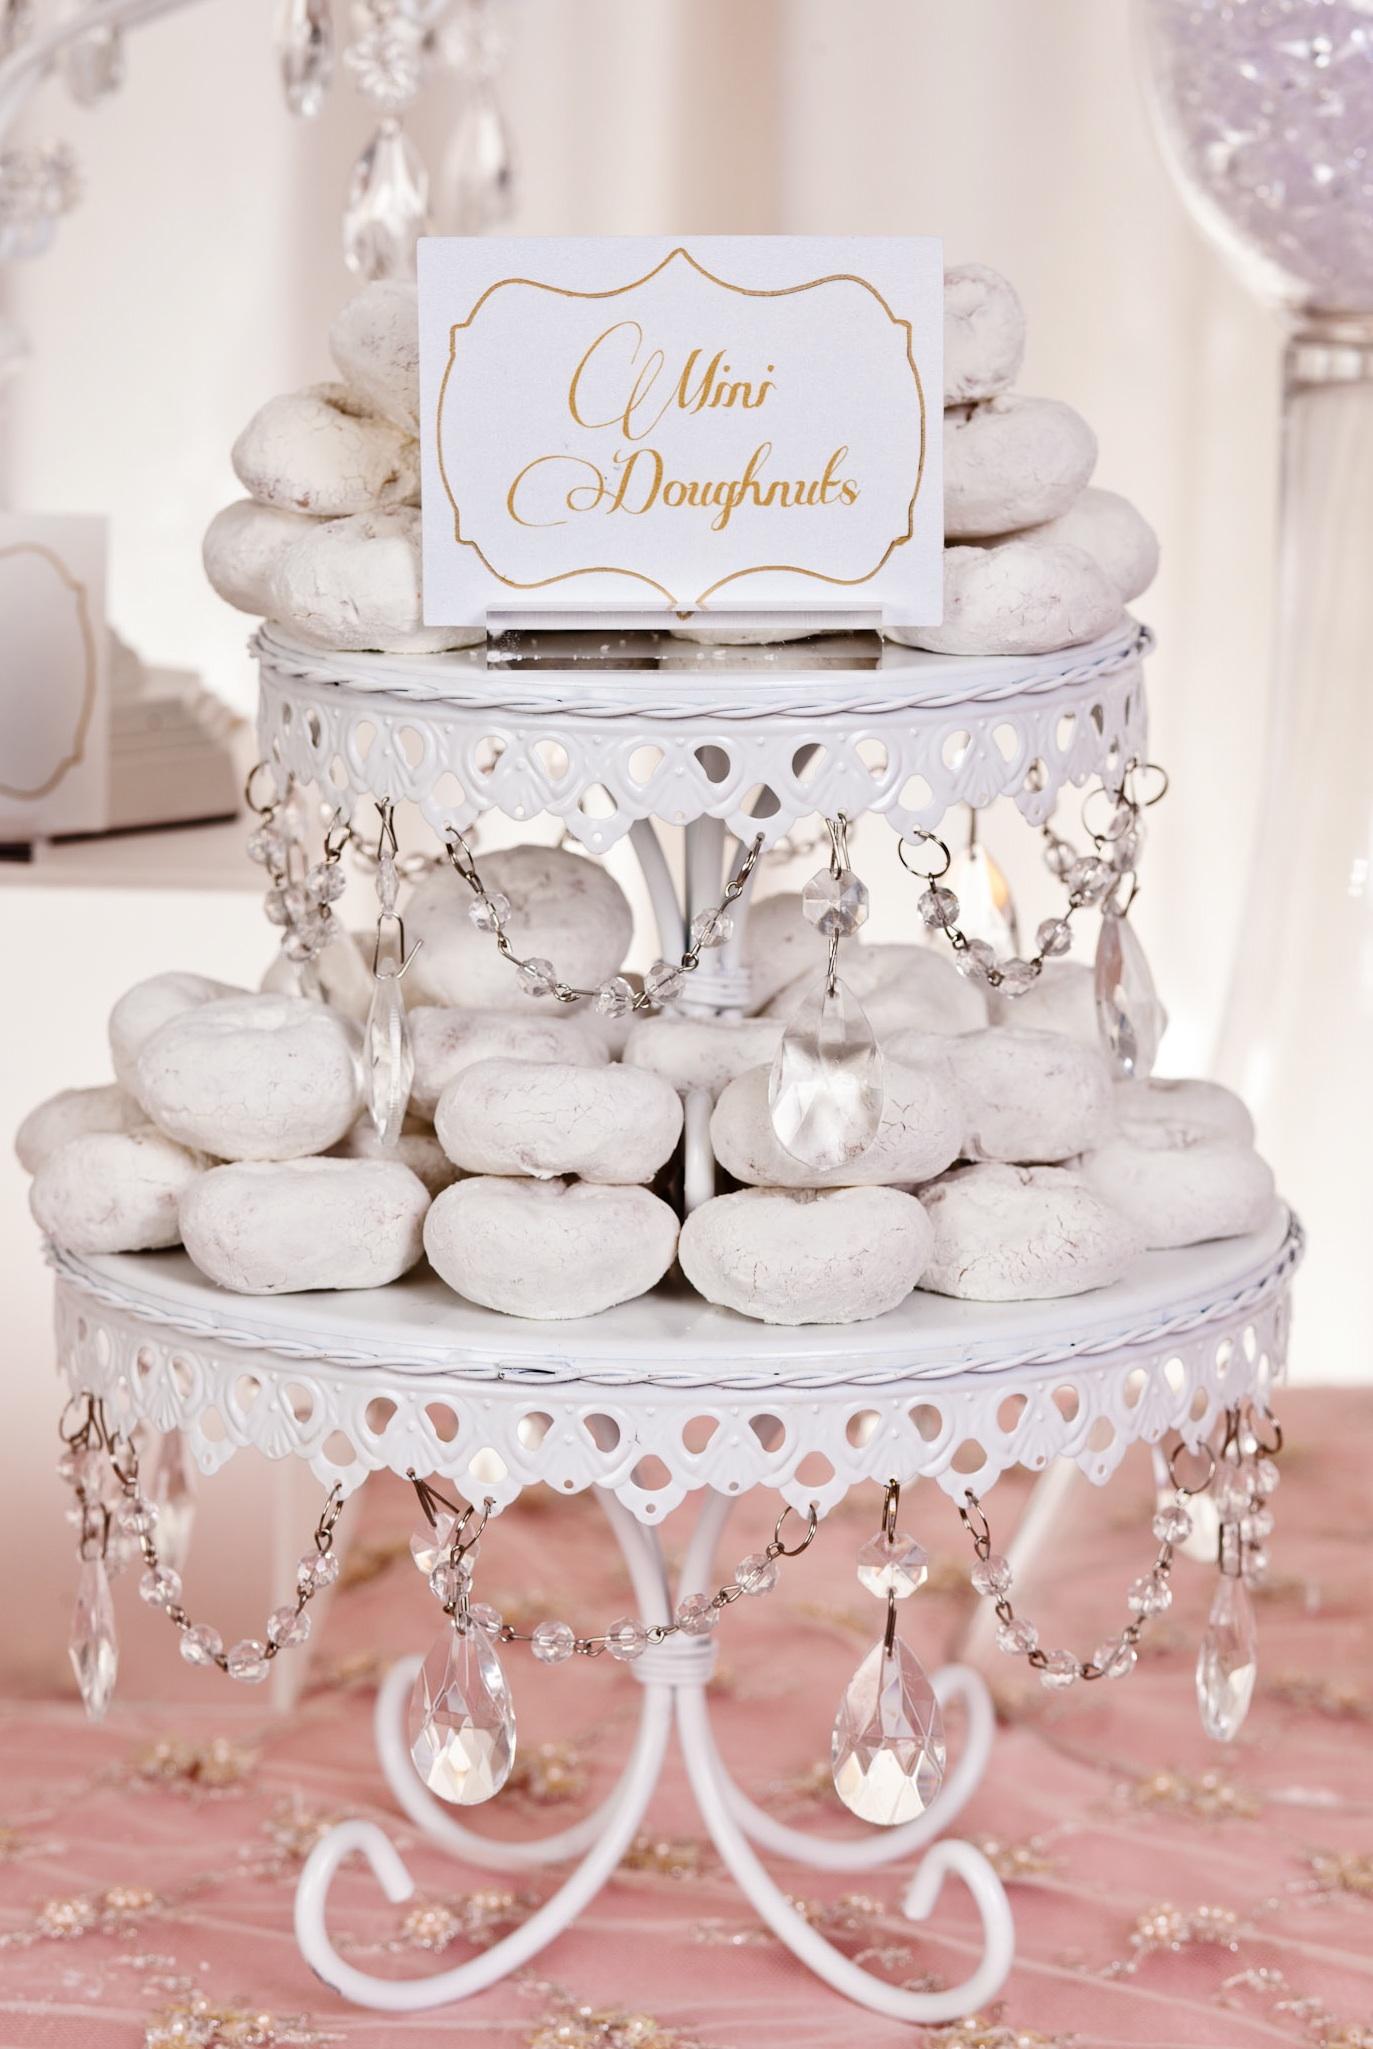 Mini Donuts   White Cake Stands